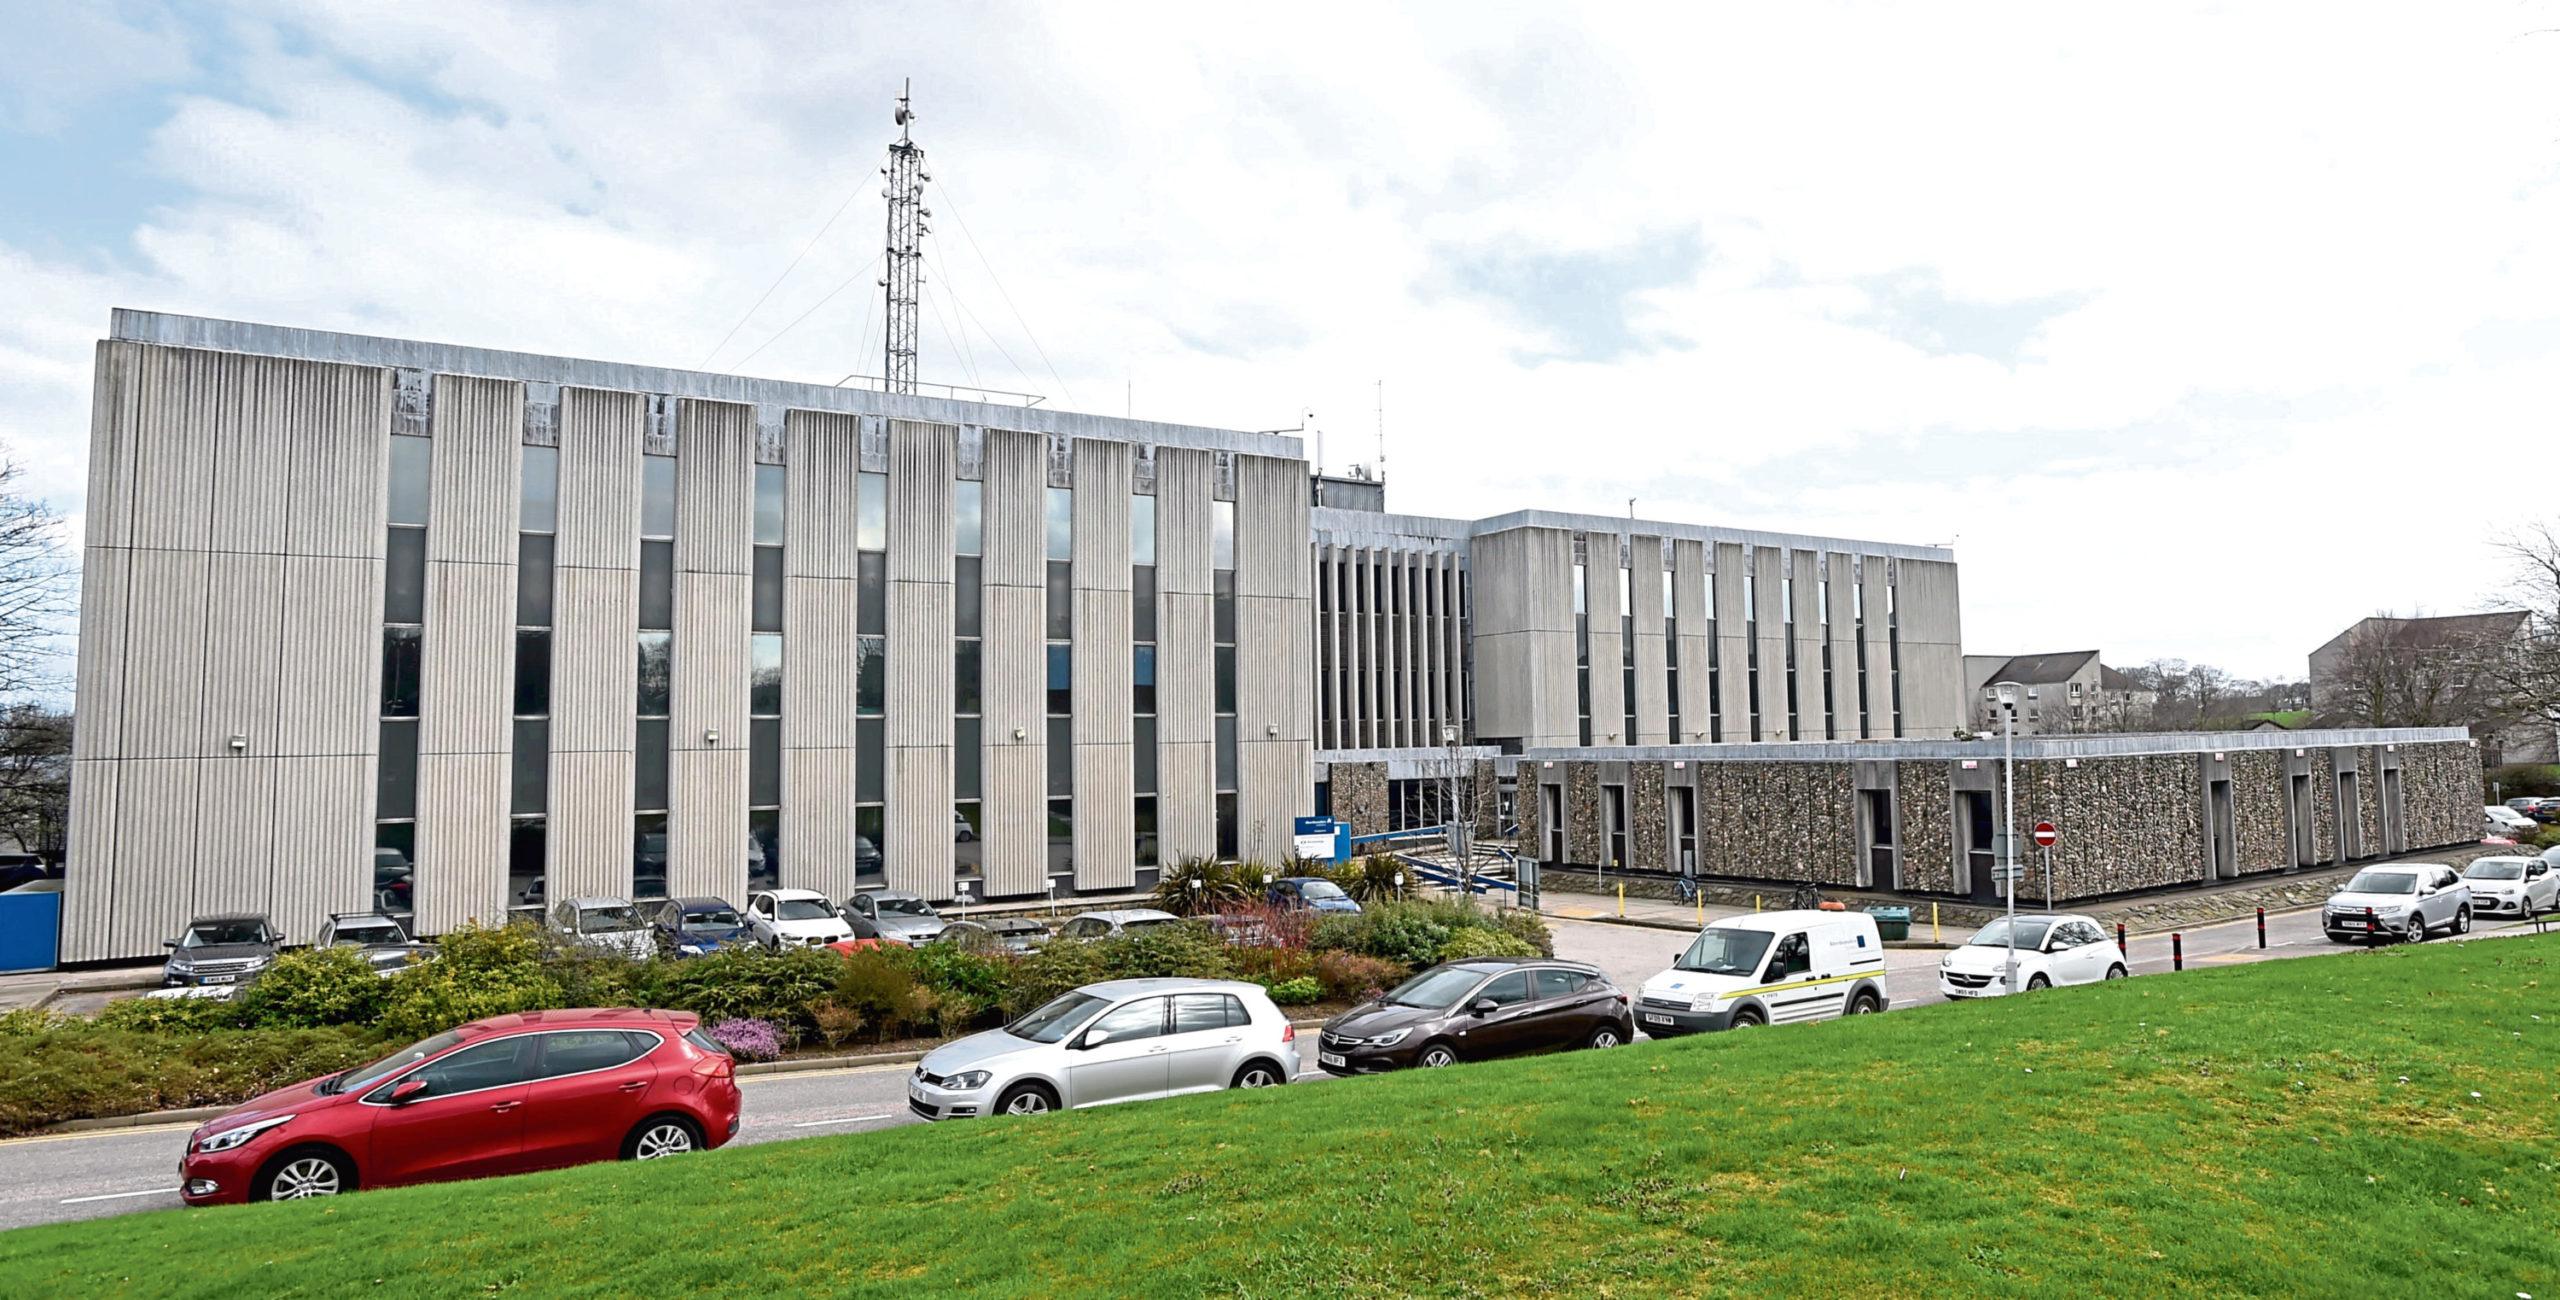 Aberdeenshire Council's communities committee will discuss funding losses due to coronavirus next week